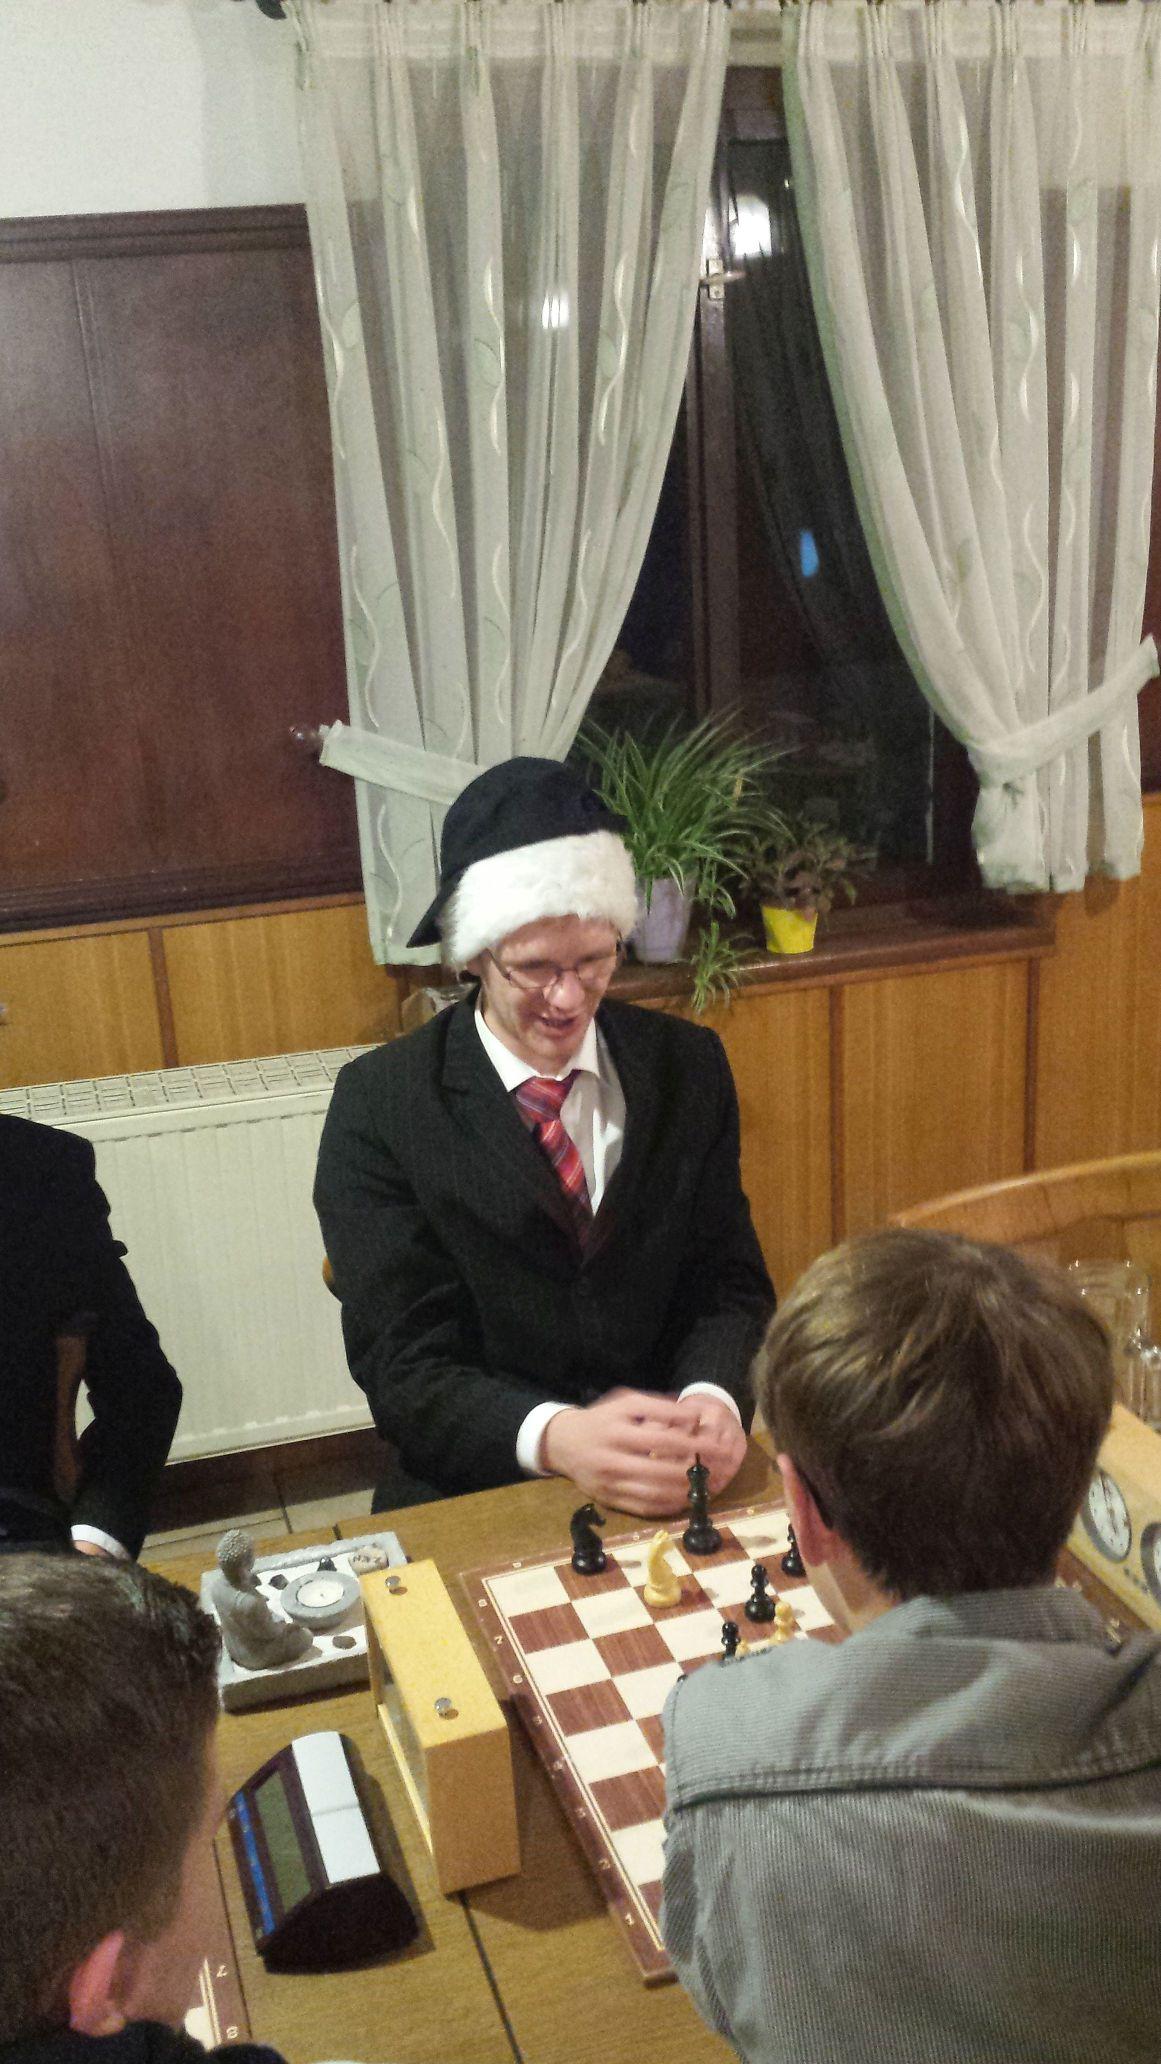 Marco Geißhirt, Genies und Wahnsinn